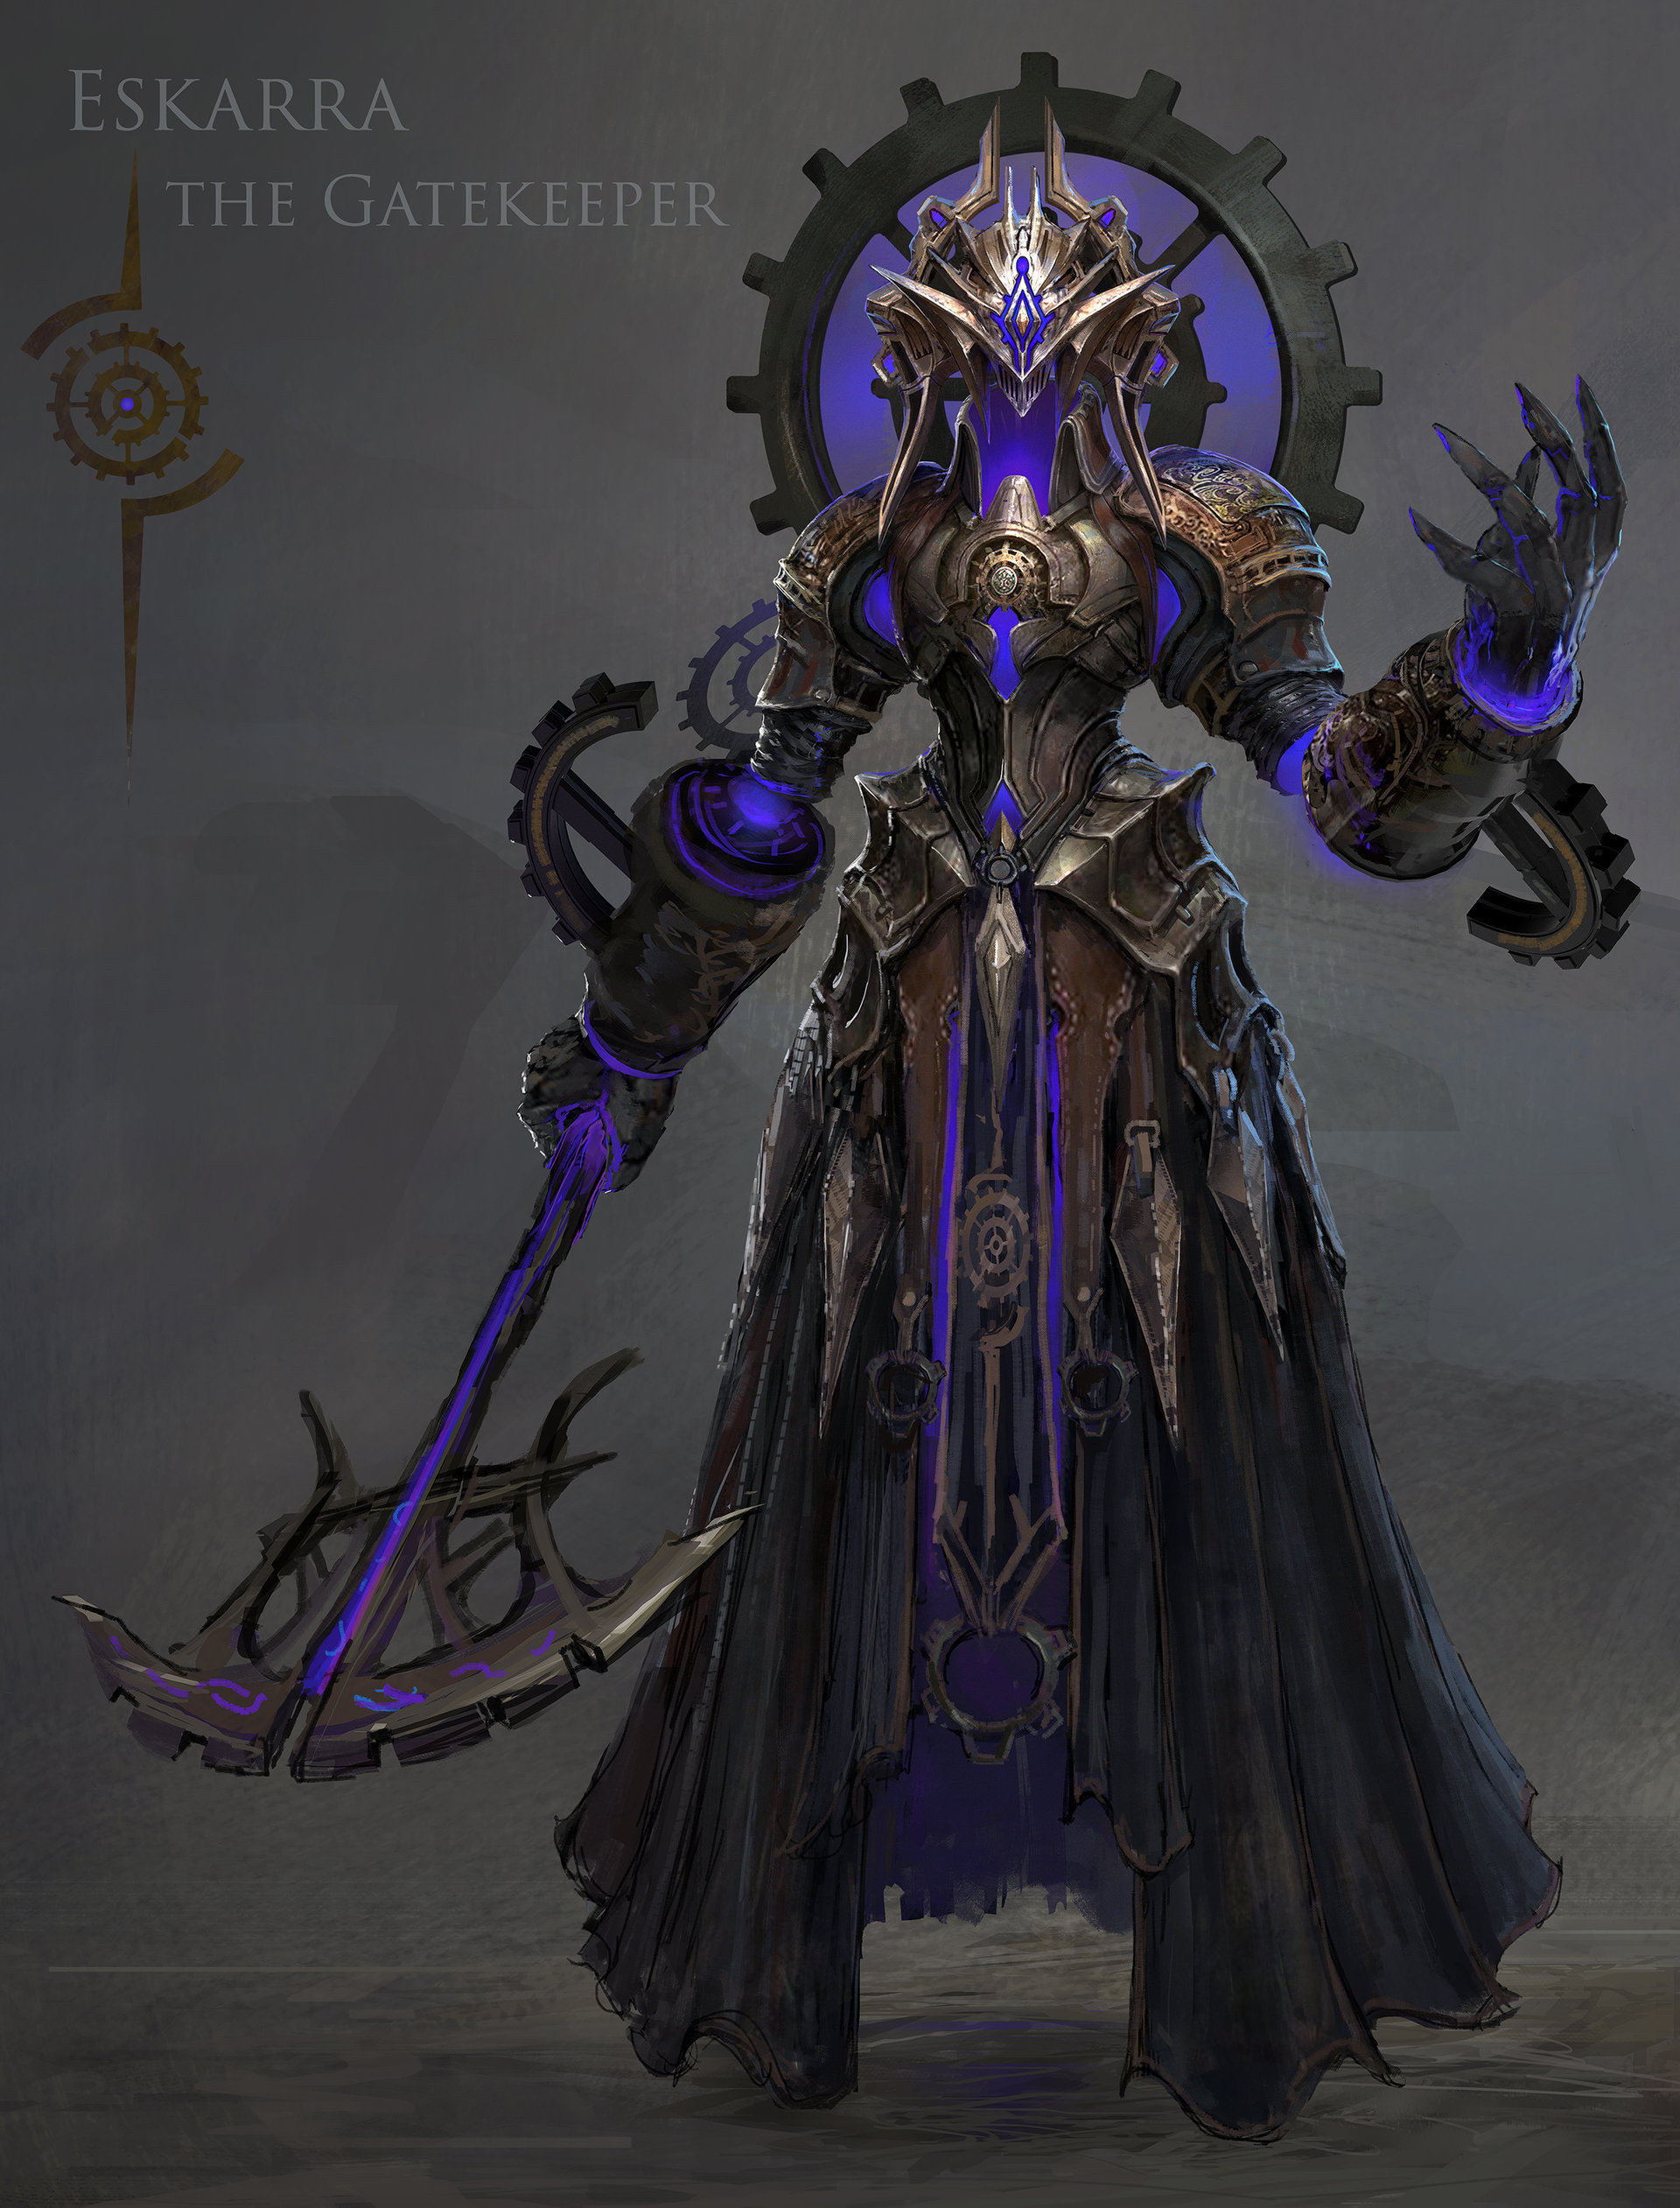 Muyoung kim eskarra gatekeeper concept myk